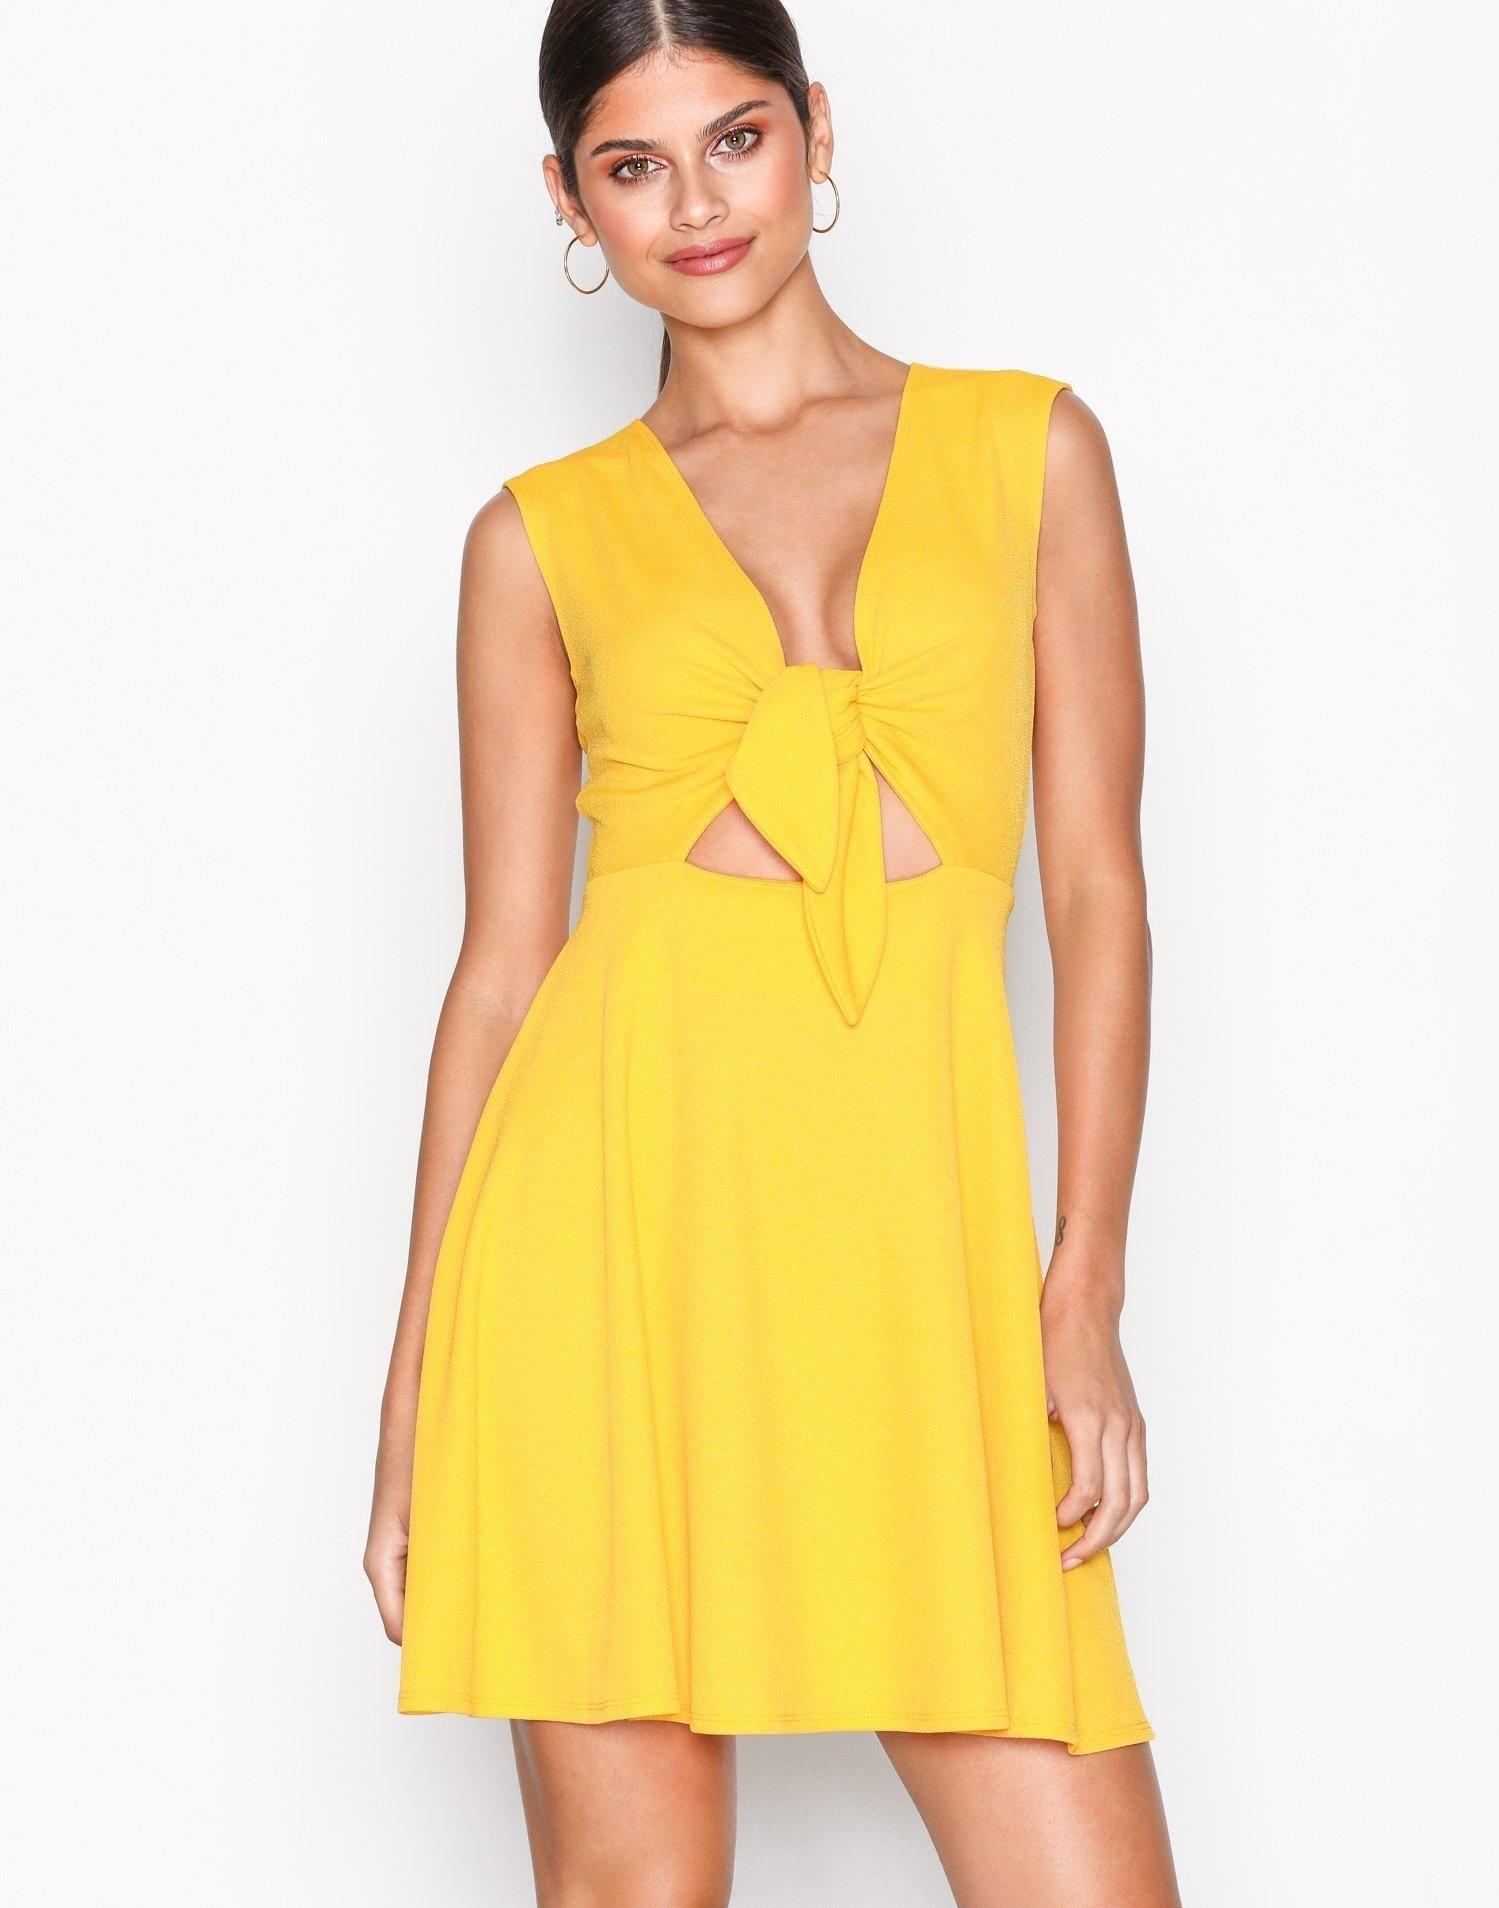 Sexy kjoler - Mote